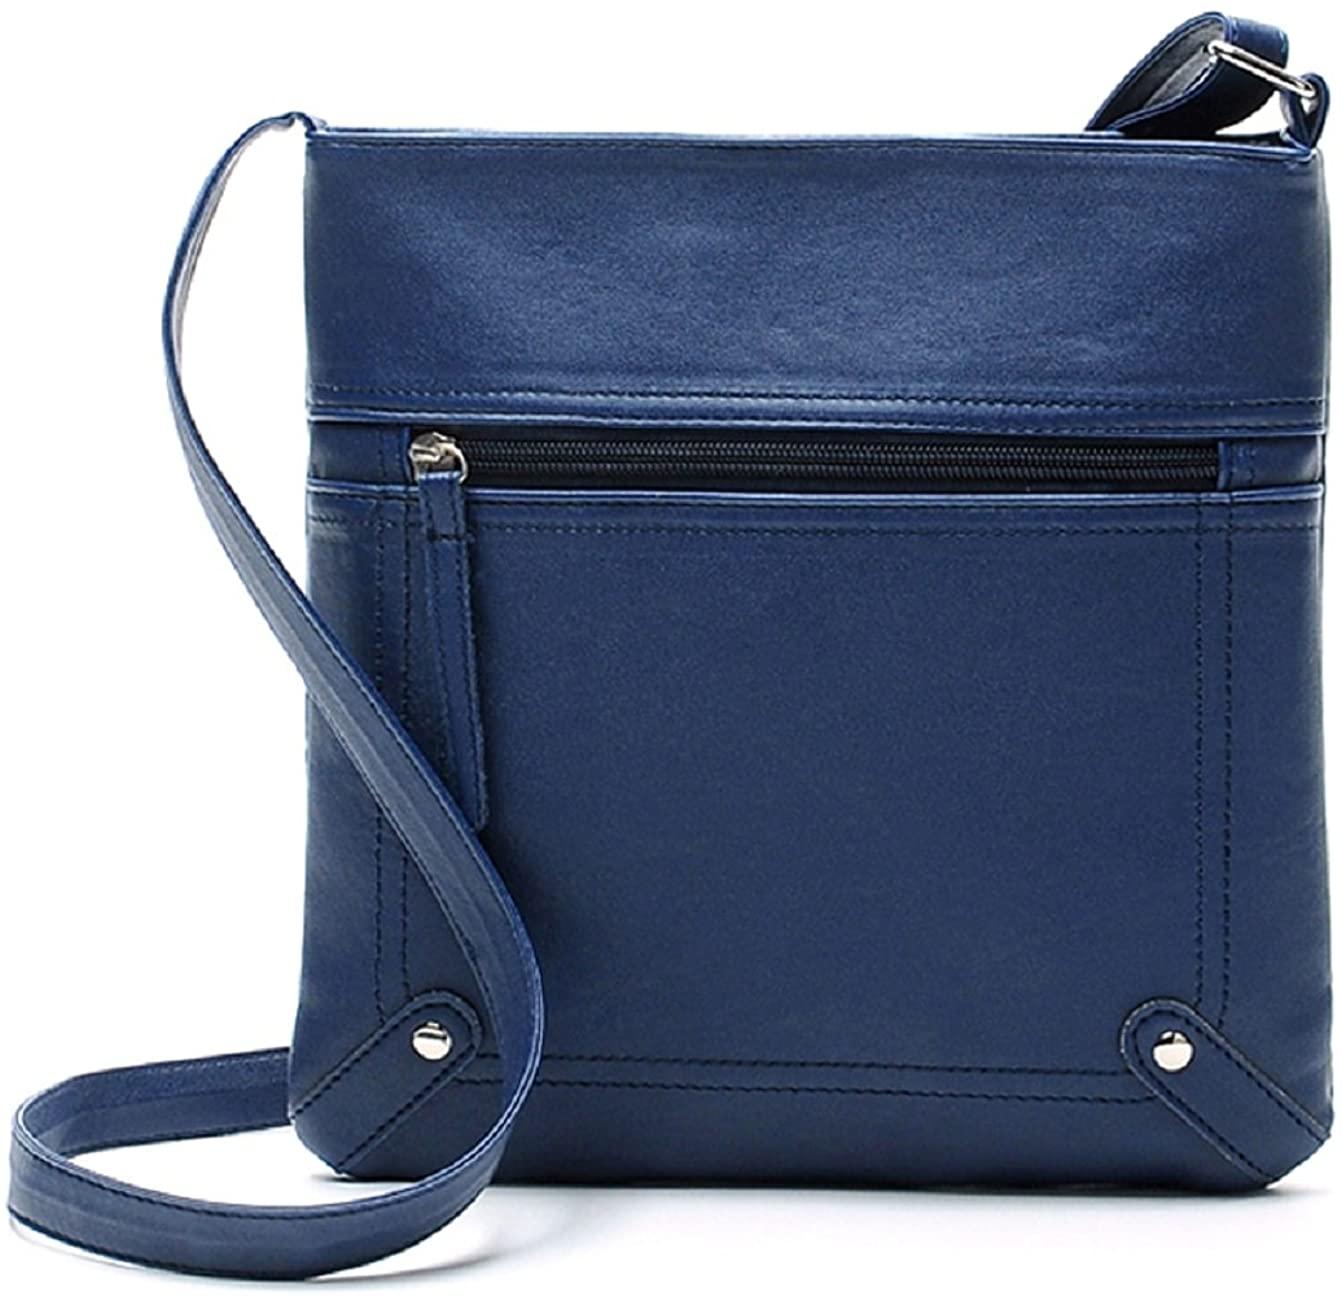 Sannysis Fashion Womens Leather Cross Body Shoulder Messenger Bag Handbag